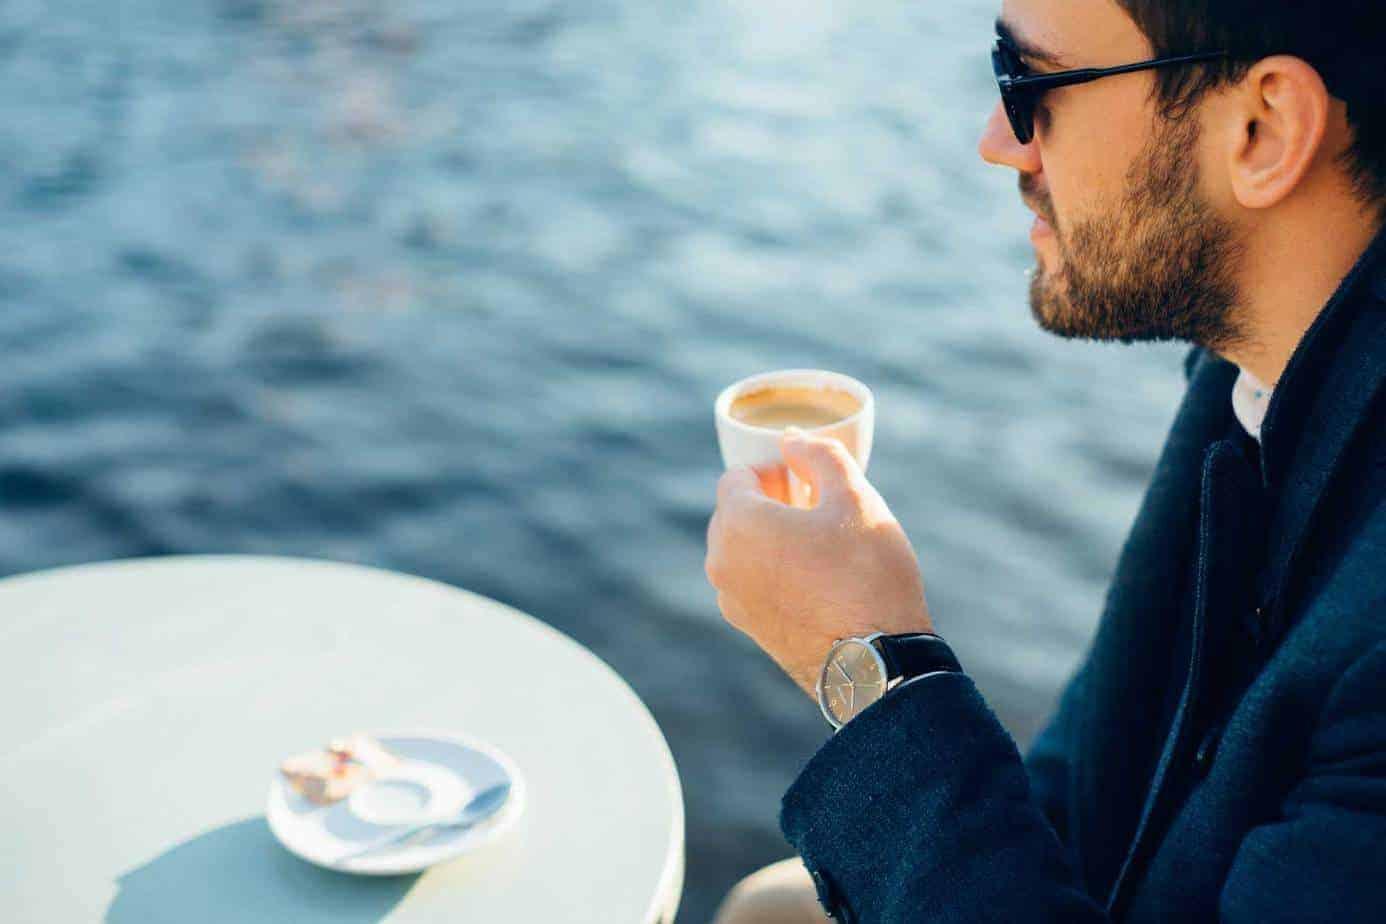 Prisma horloges slimline voor heren blauw sun ray kwaliteitshorloge mooi horloge